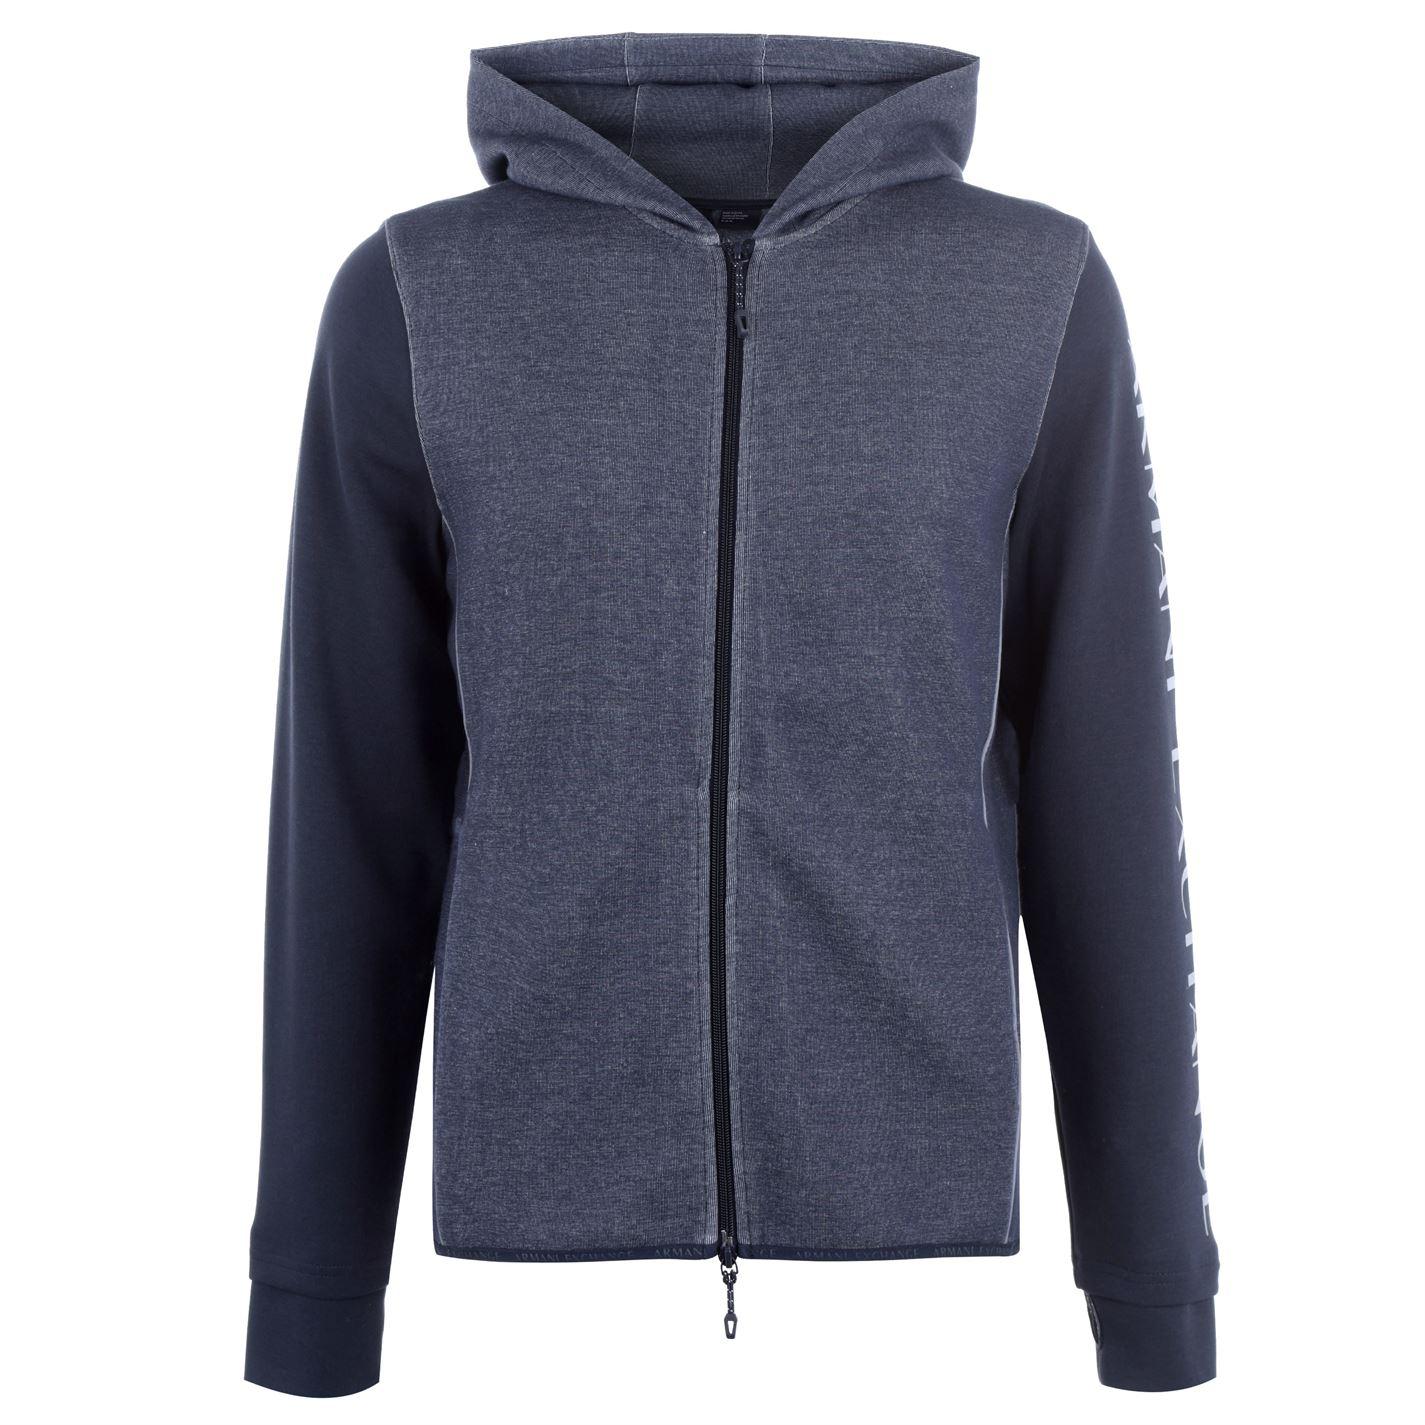 Mergi la Bluza de trening Armani Exchange Logo cu fermoar cu gluga bleumarin